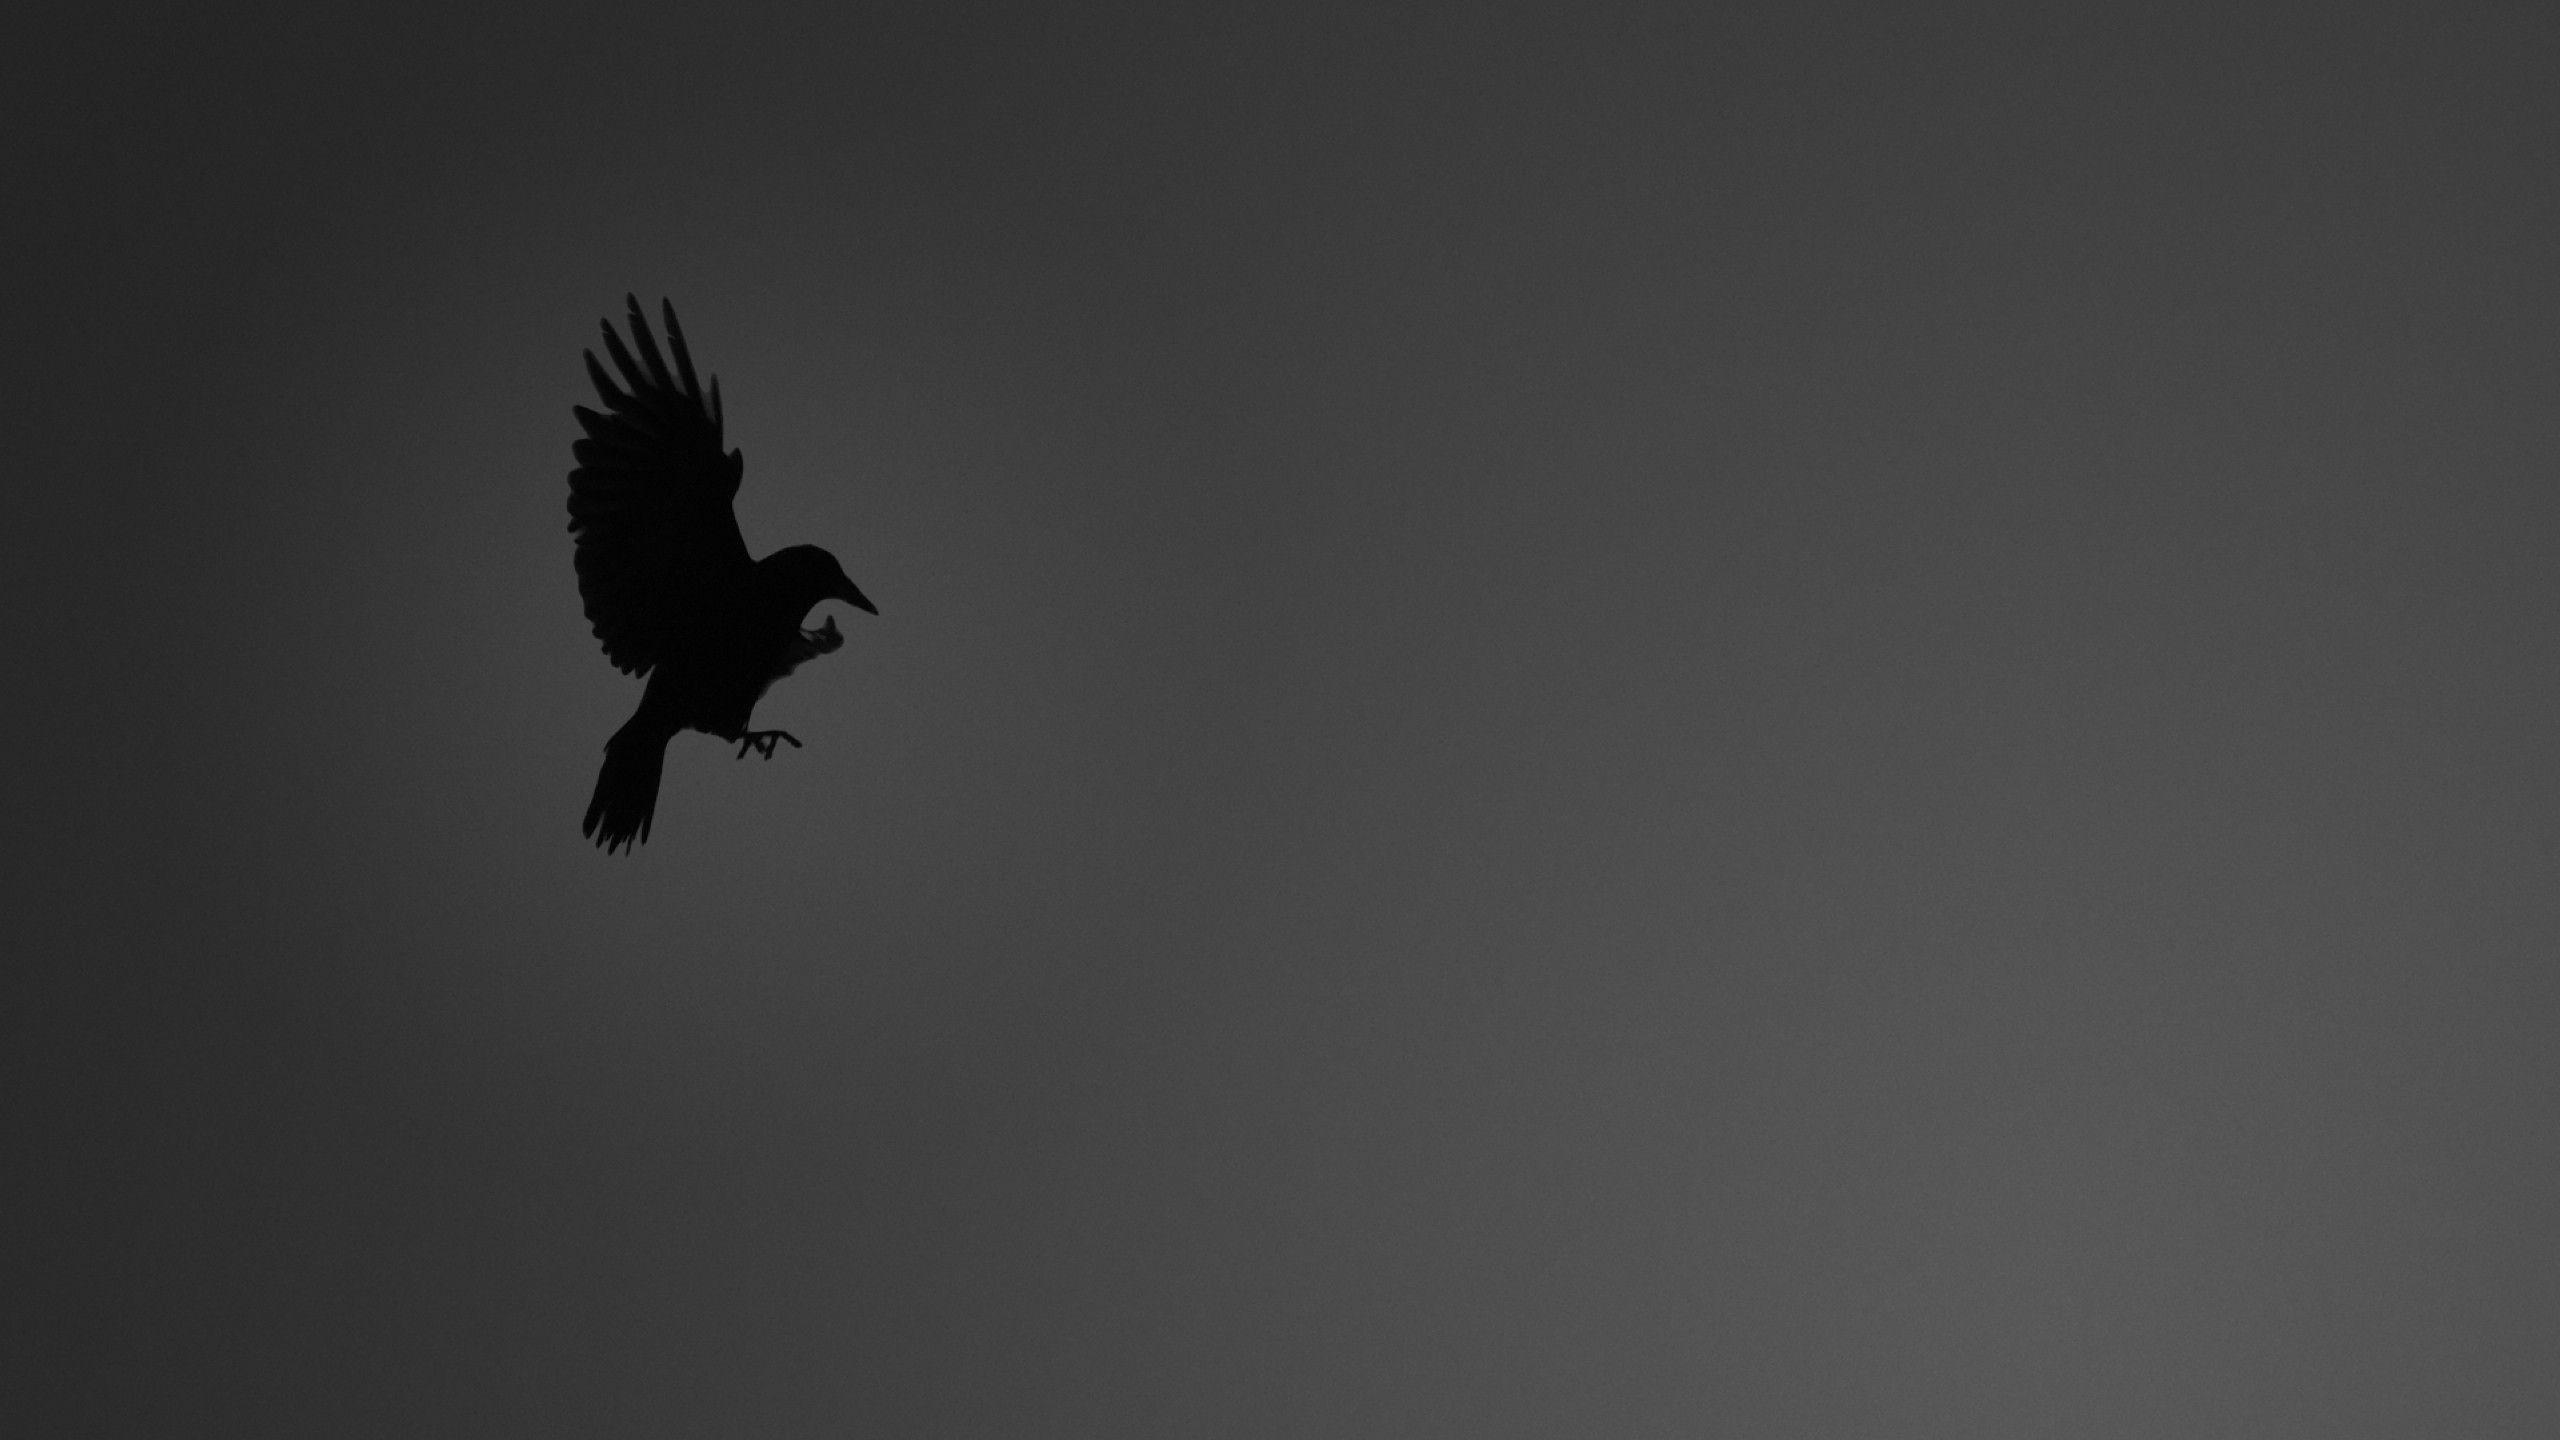 Black Crow Wallpaper DESEMBARALHE